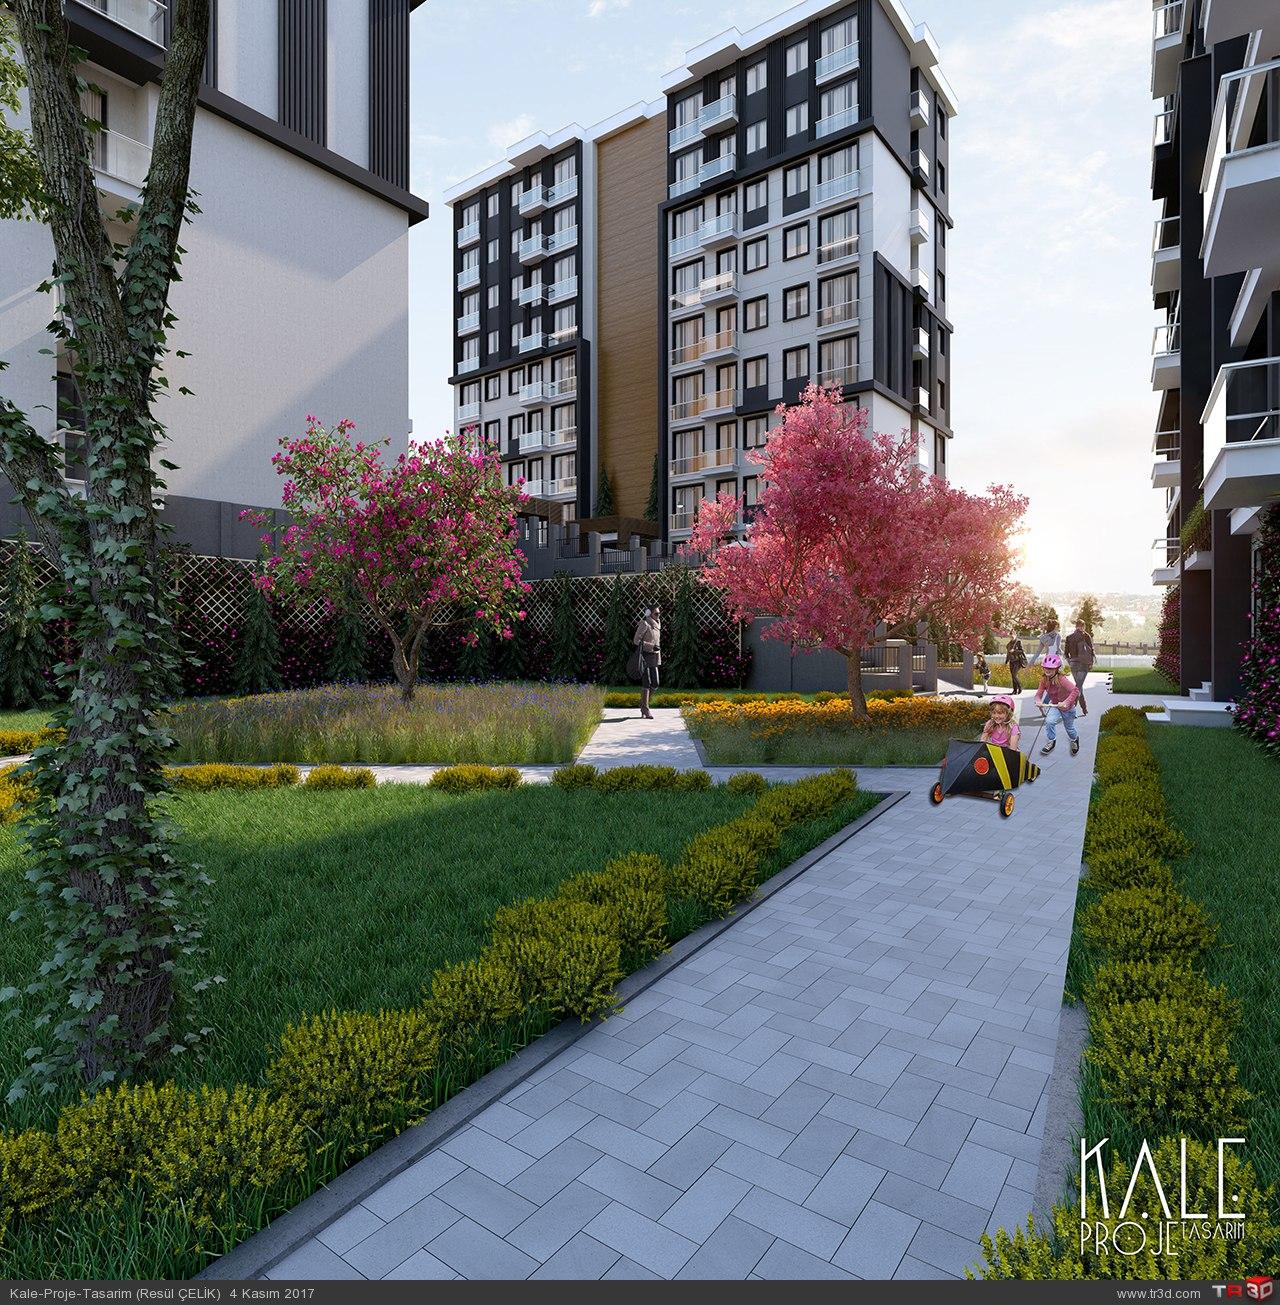 Kale 3d (Demir House)